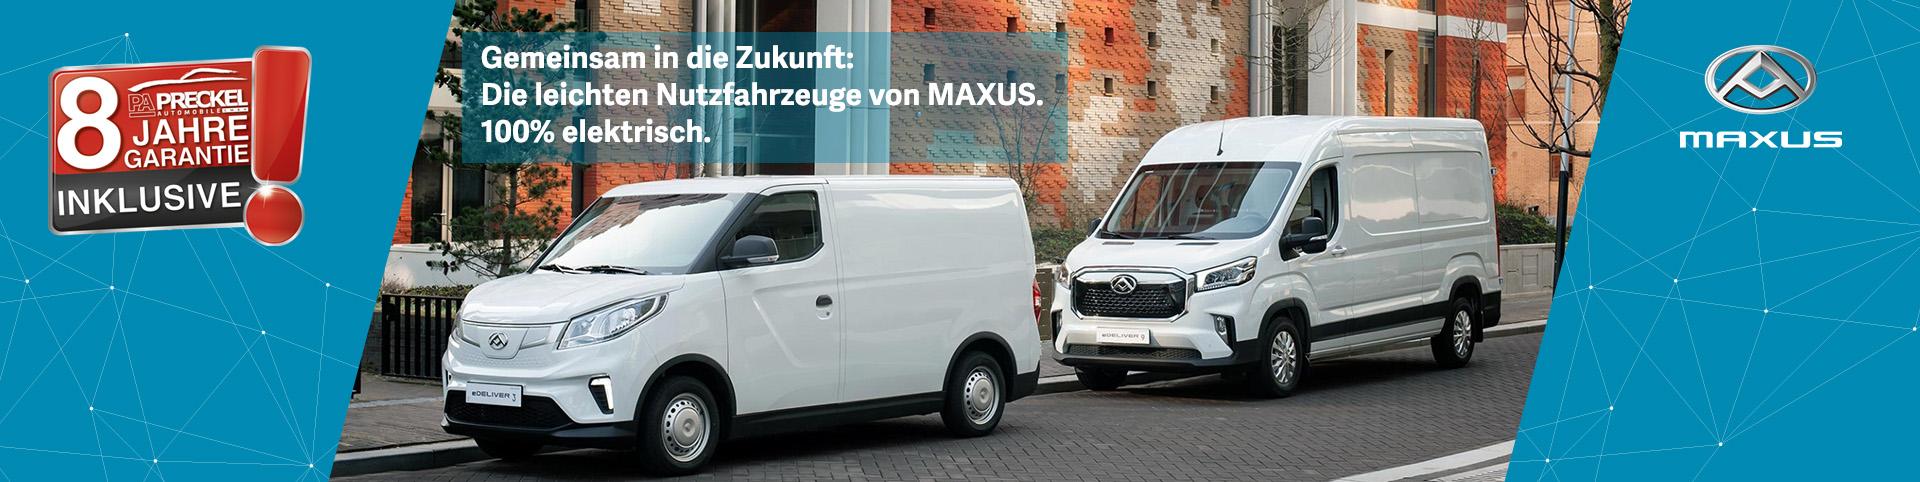 Maxus Nutzfahrzeuge bei Preckel Automobile